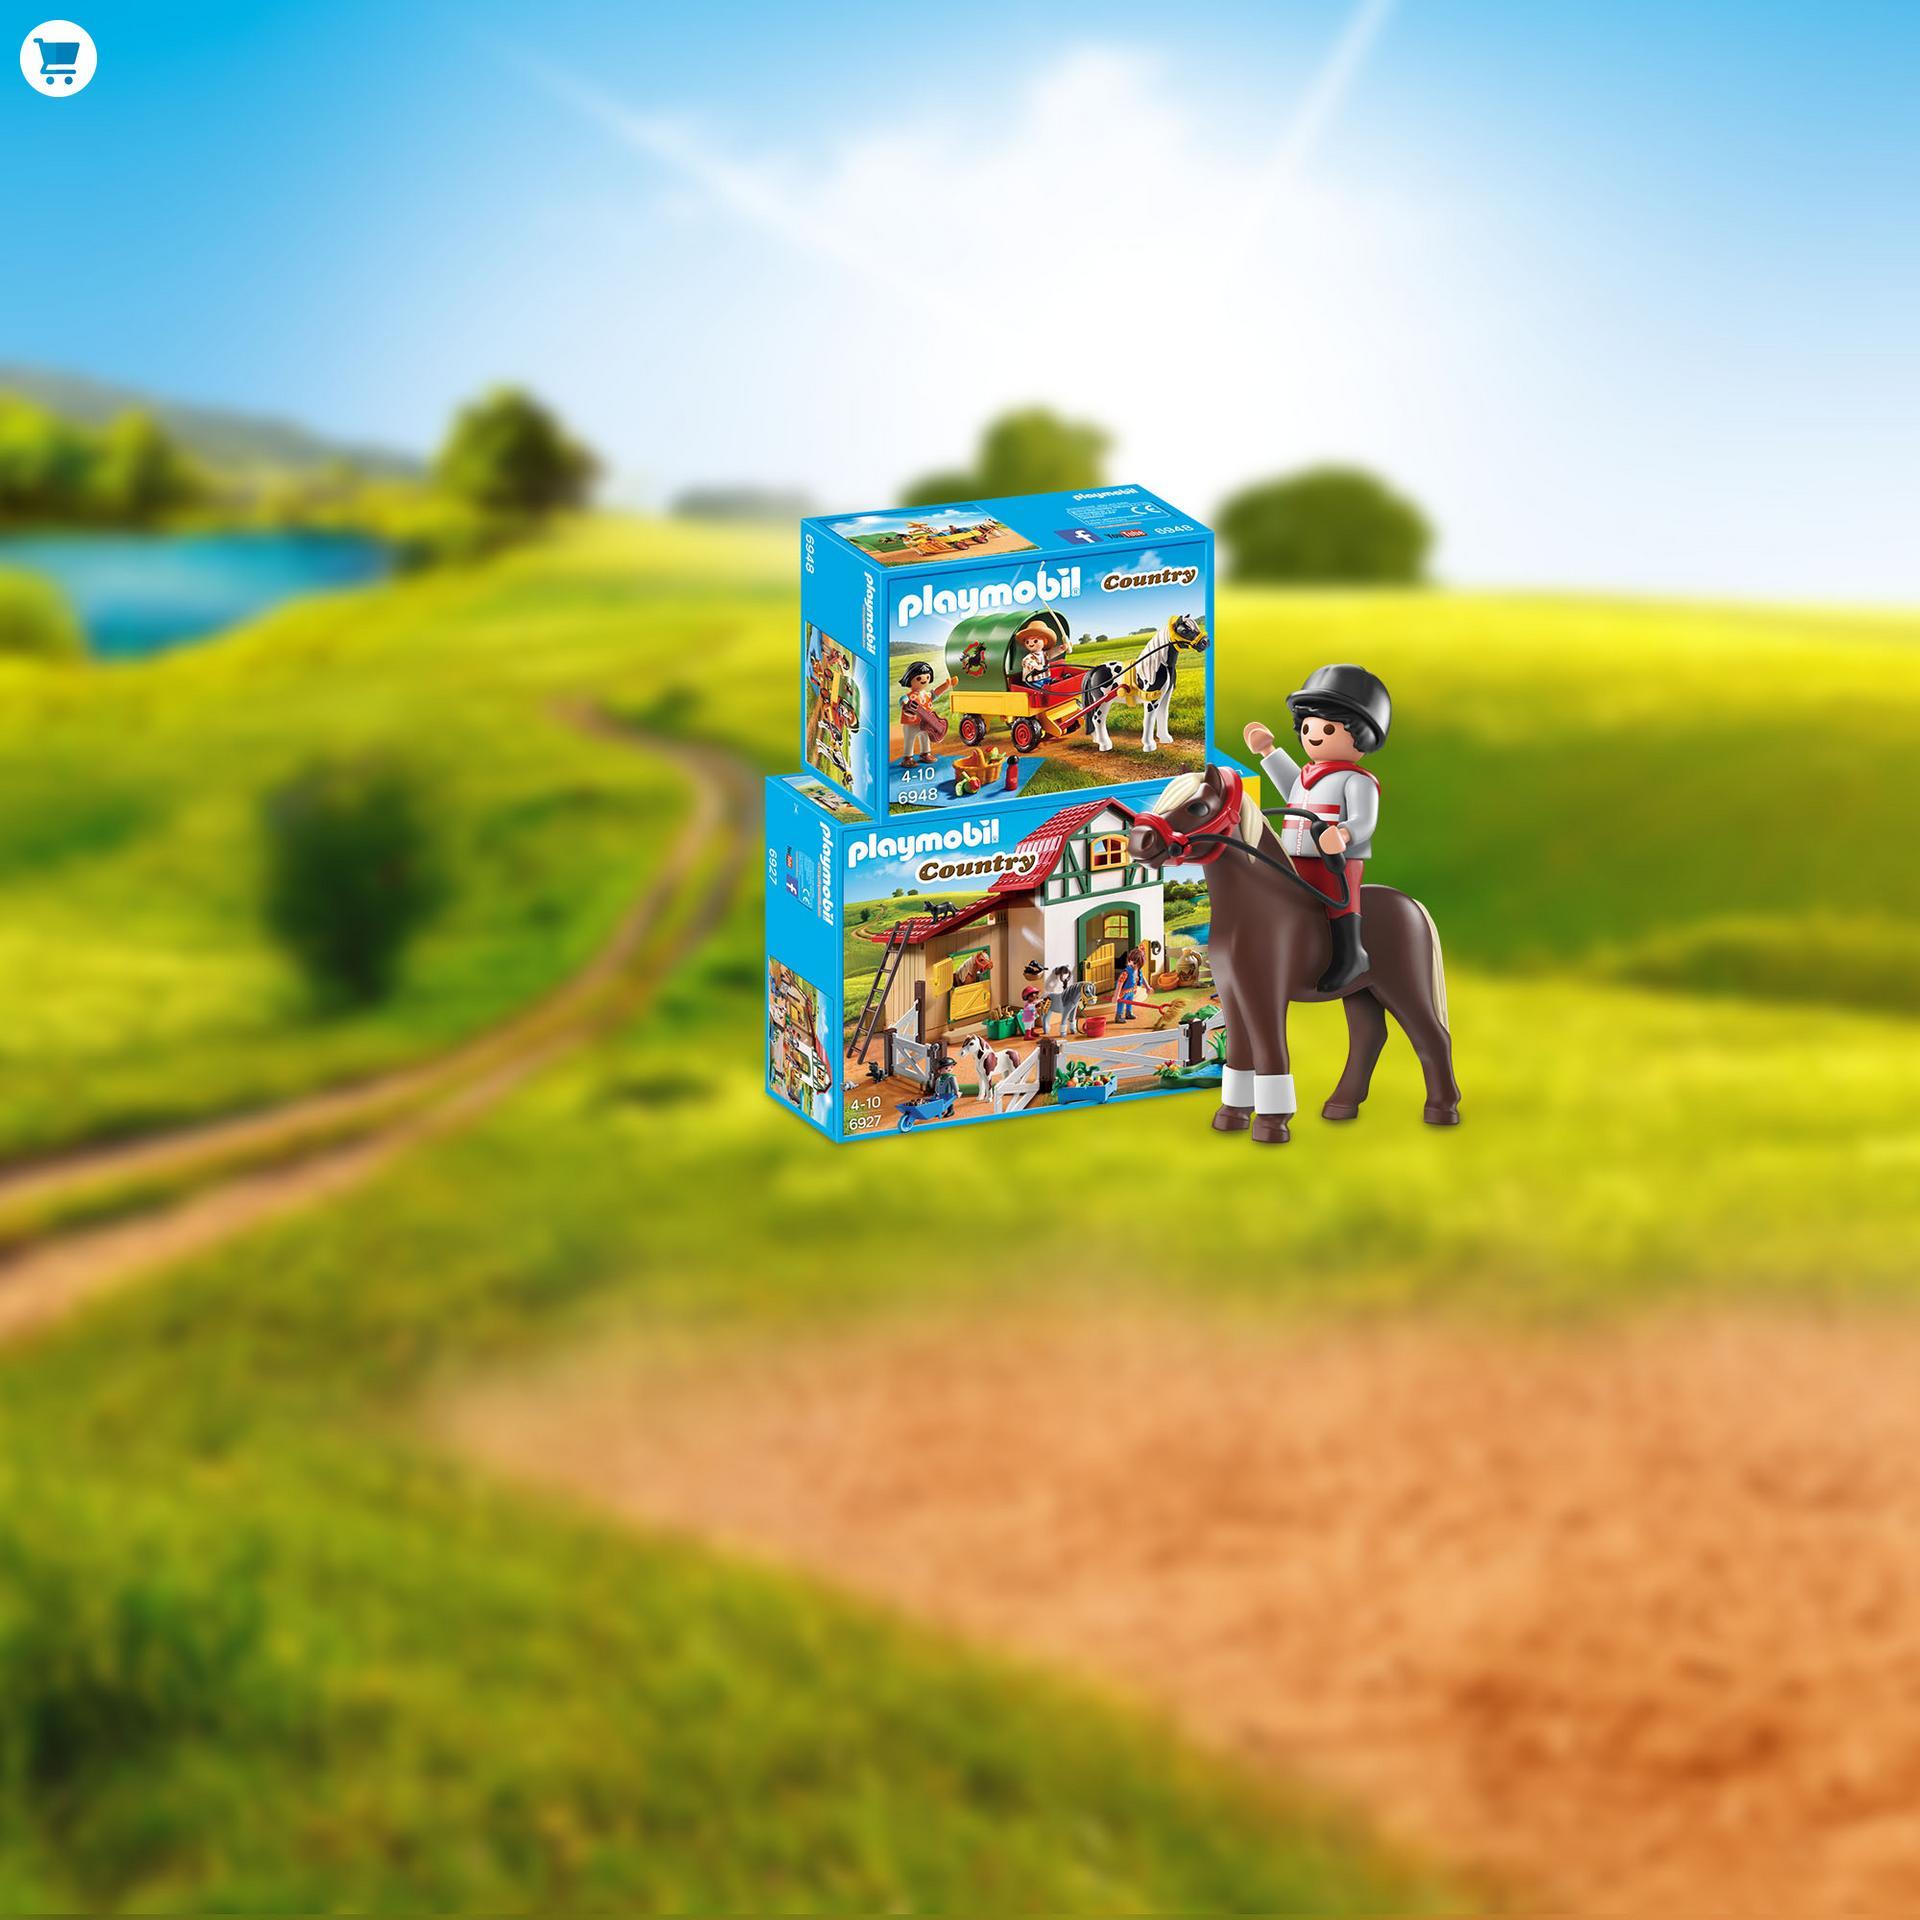 playmobil jouets boutique officielle france playmobil france. Black Bedroom Furniture Sets. Home Design Ideas